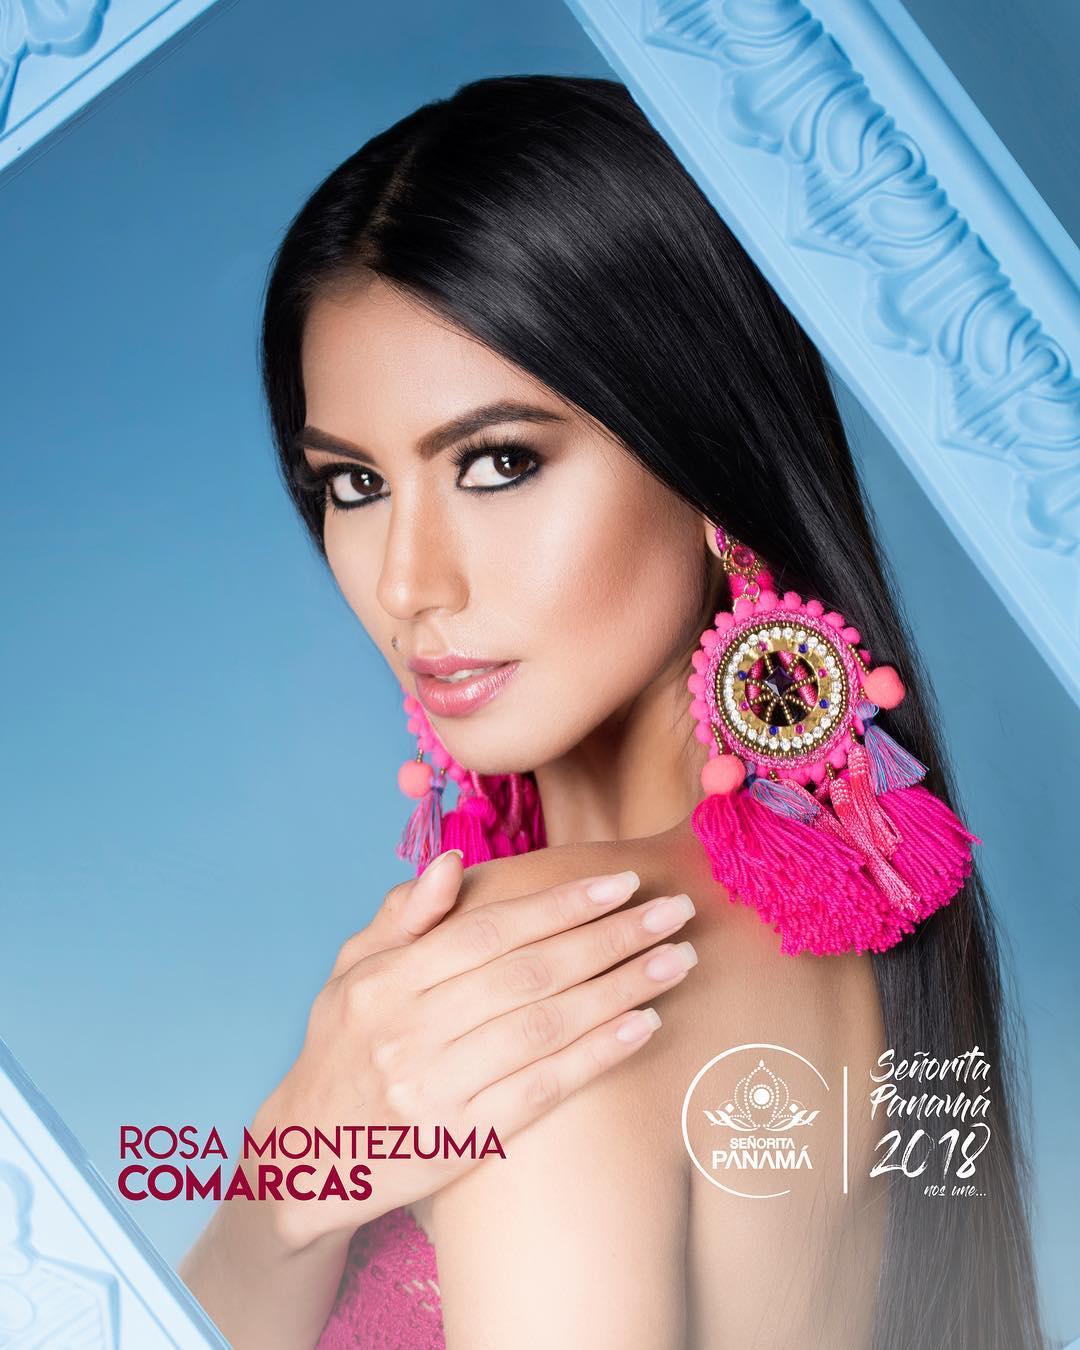 señorita miss colombia 2018 candidates candidatas contestants delegates Miss Comarcas Rosa Montezuma